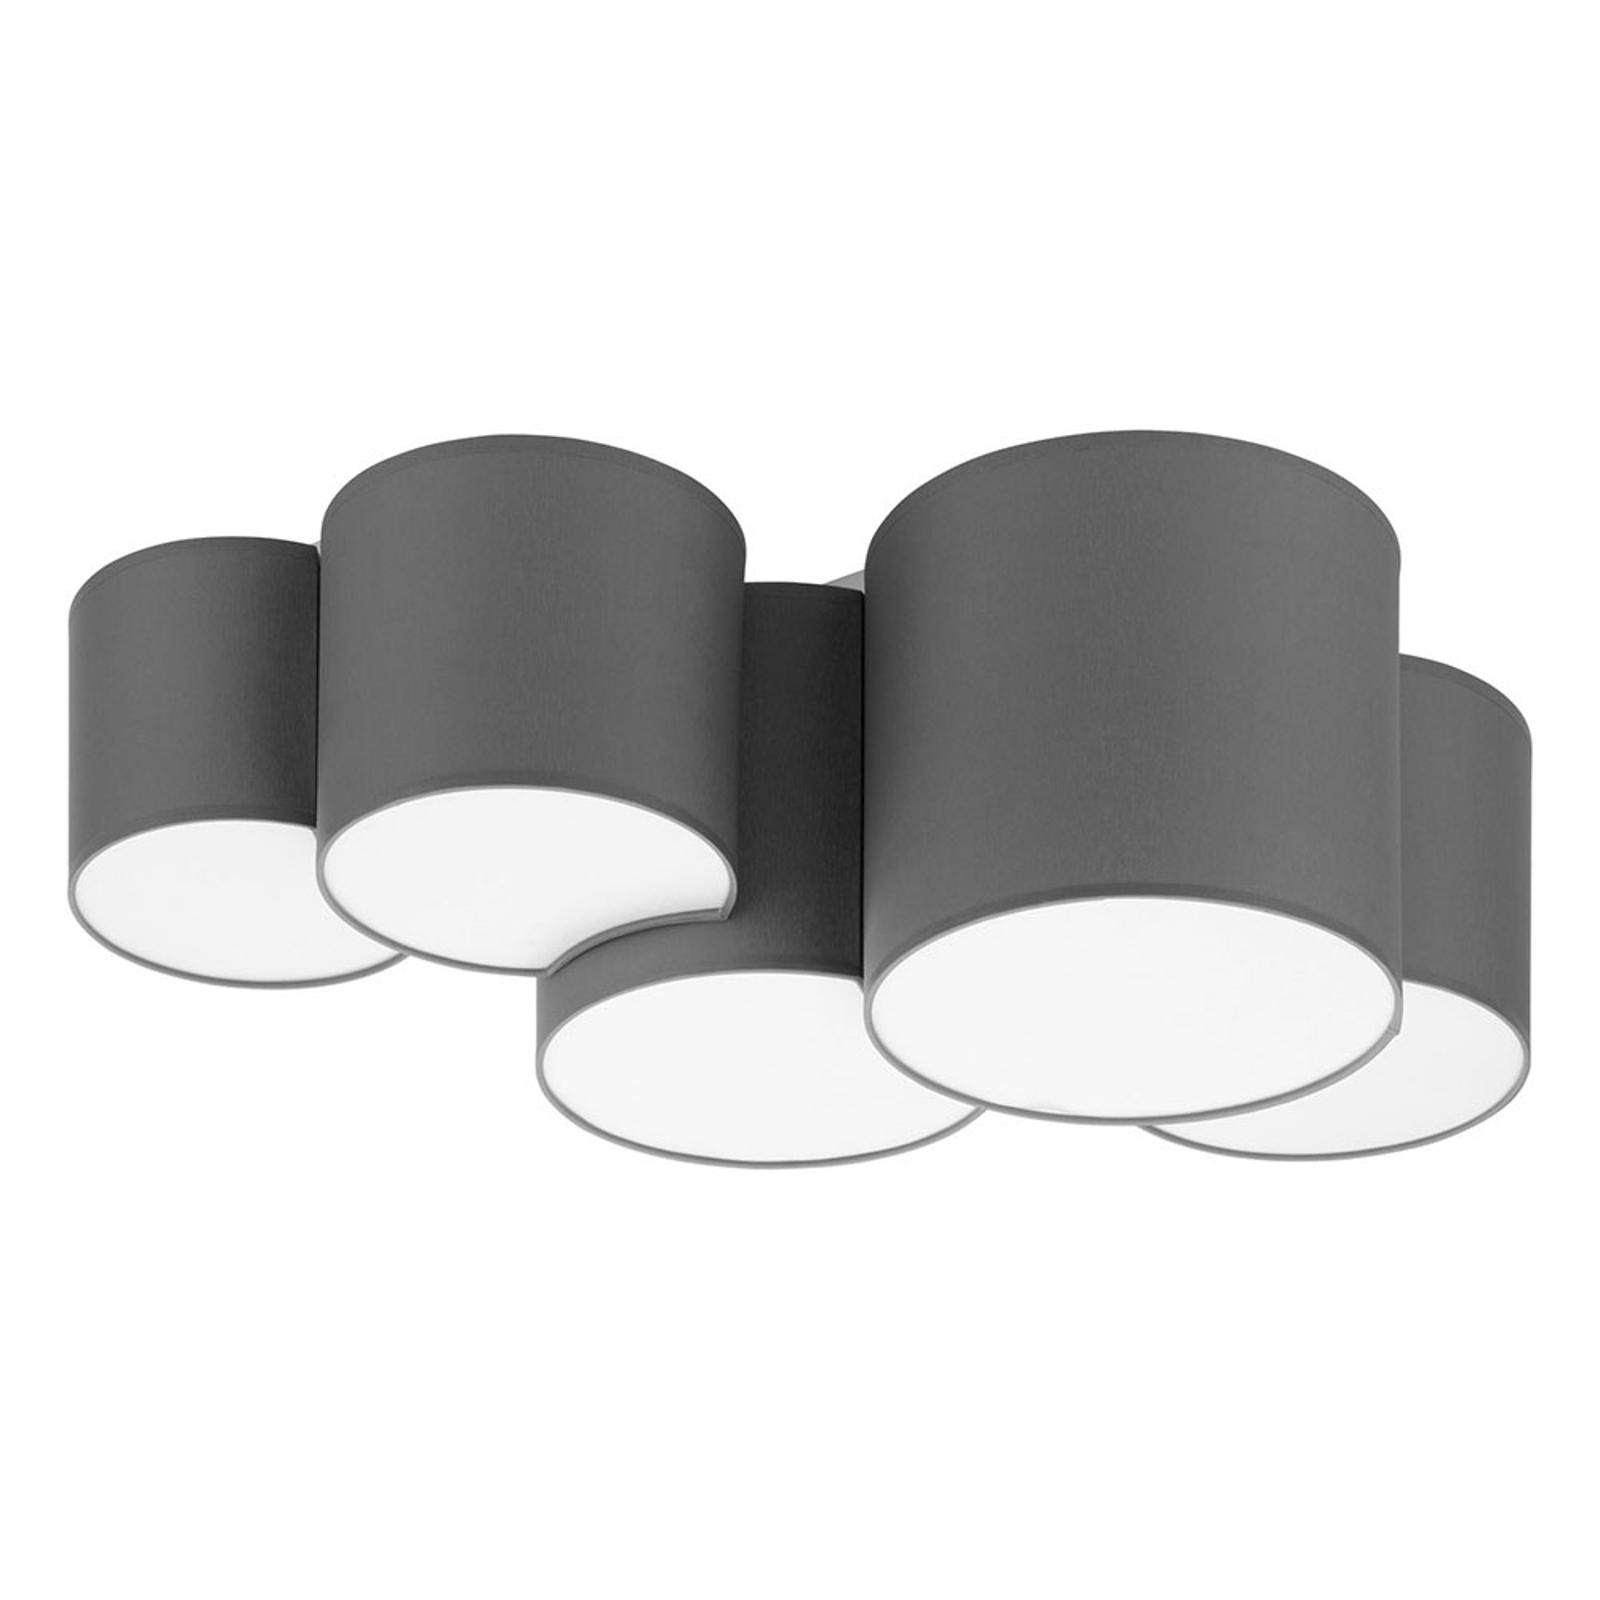 Lampa sufitowa Mona 5-punktowa, szara